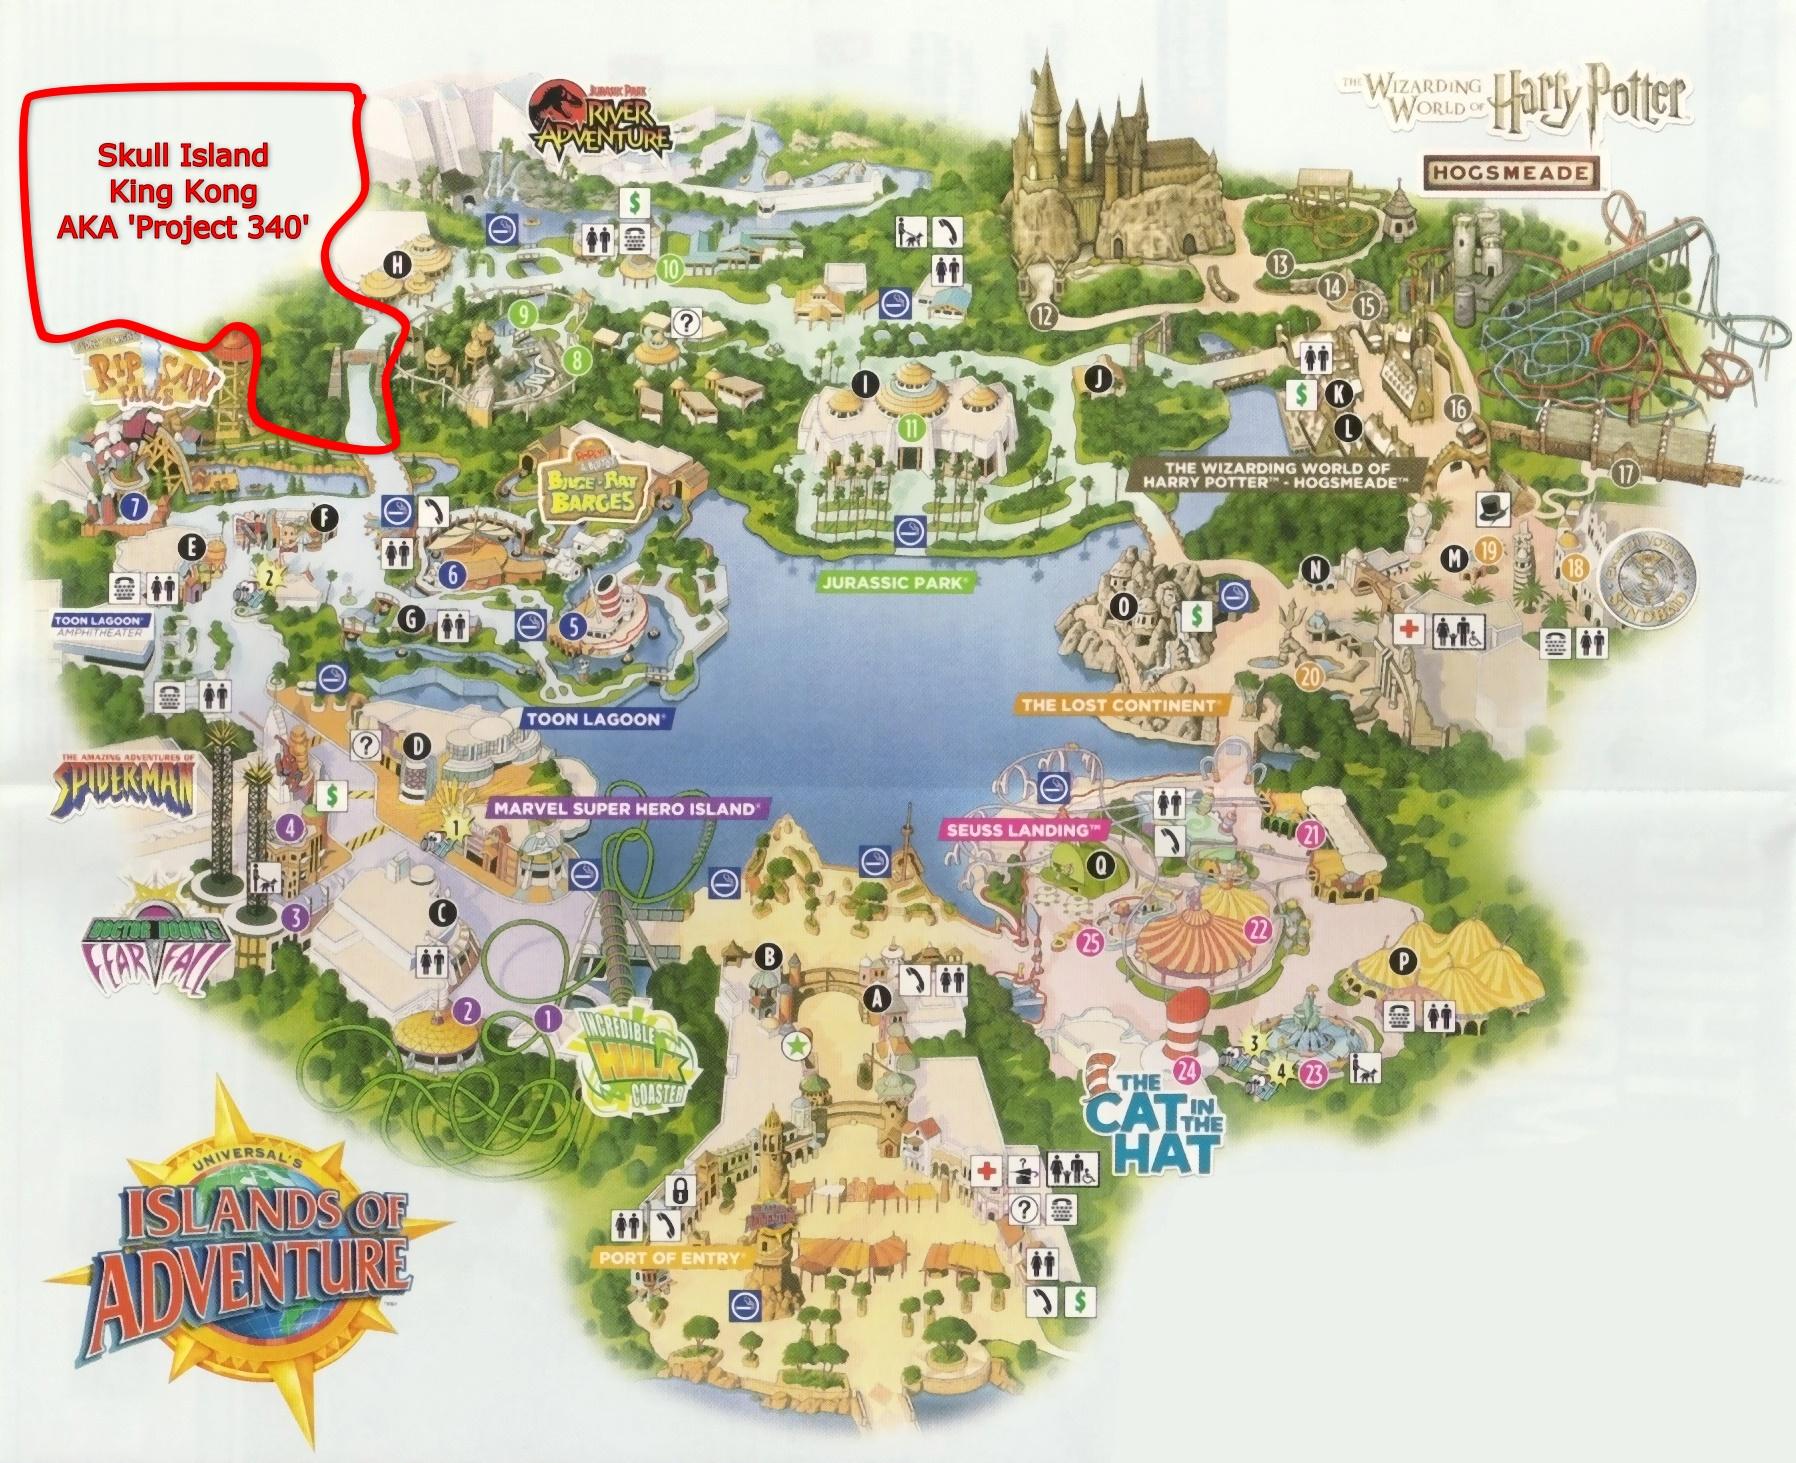 Universal Studios Orlando Map map of arizona with cities